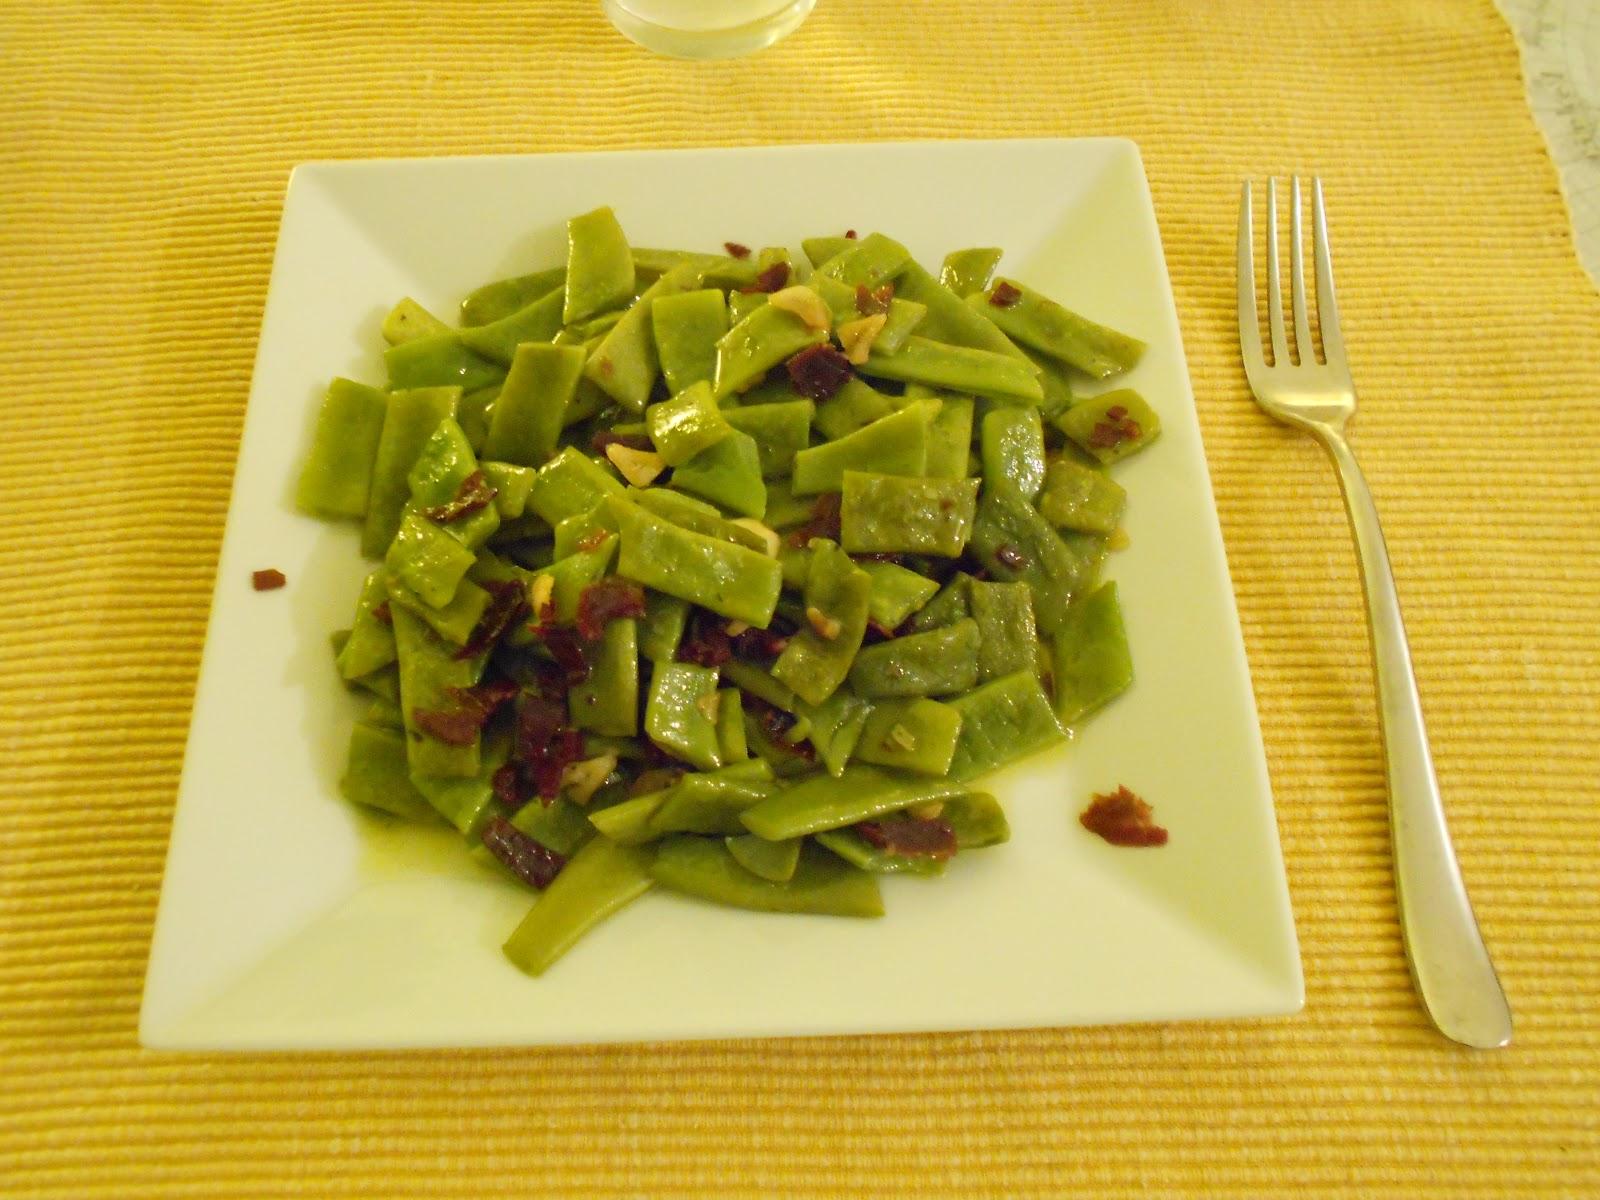 Ro cocina jud as verdes salteadas con jam n - Como hacer judias verdes ...